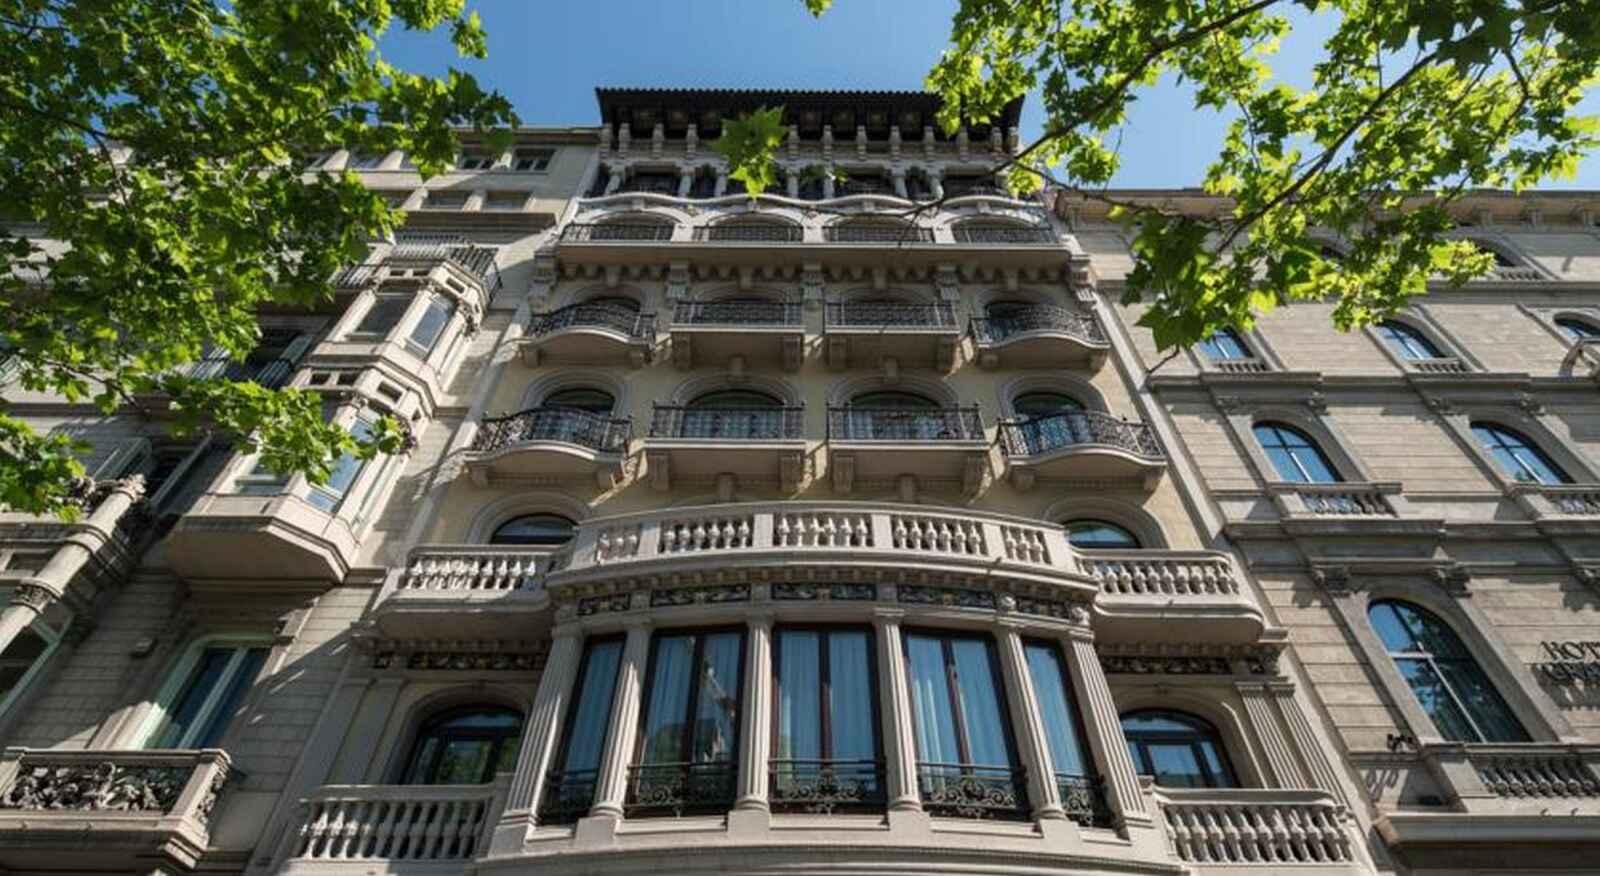 Espagne : Catalonia Passeig de Gracia - Barcelone